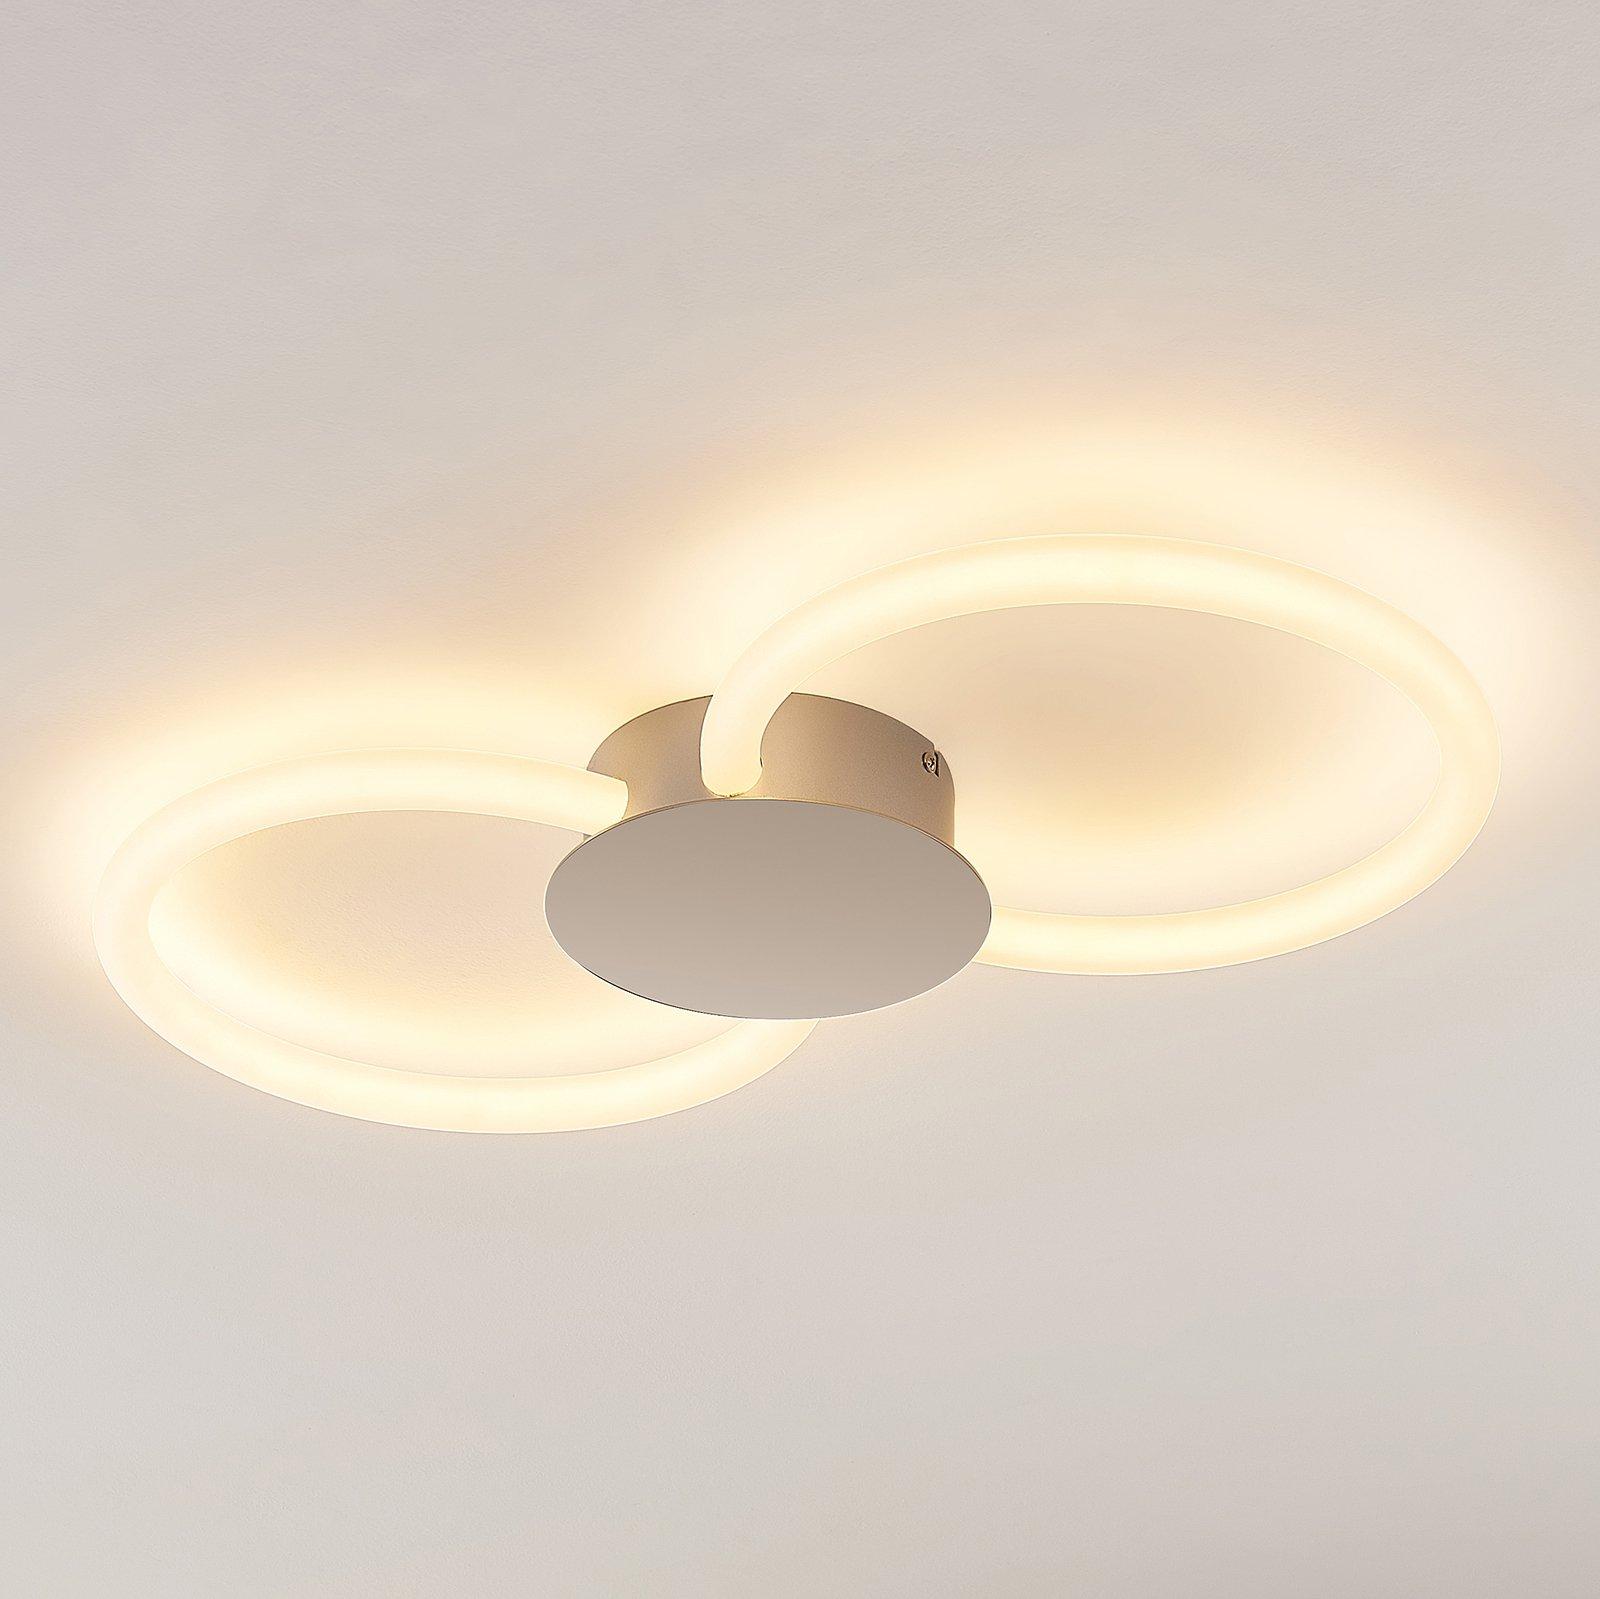 Lucande Clasa LED-taklampe, 2 lyskilder